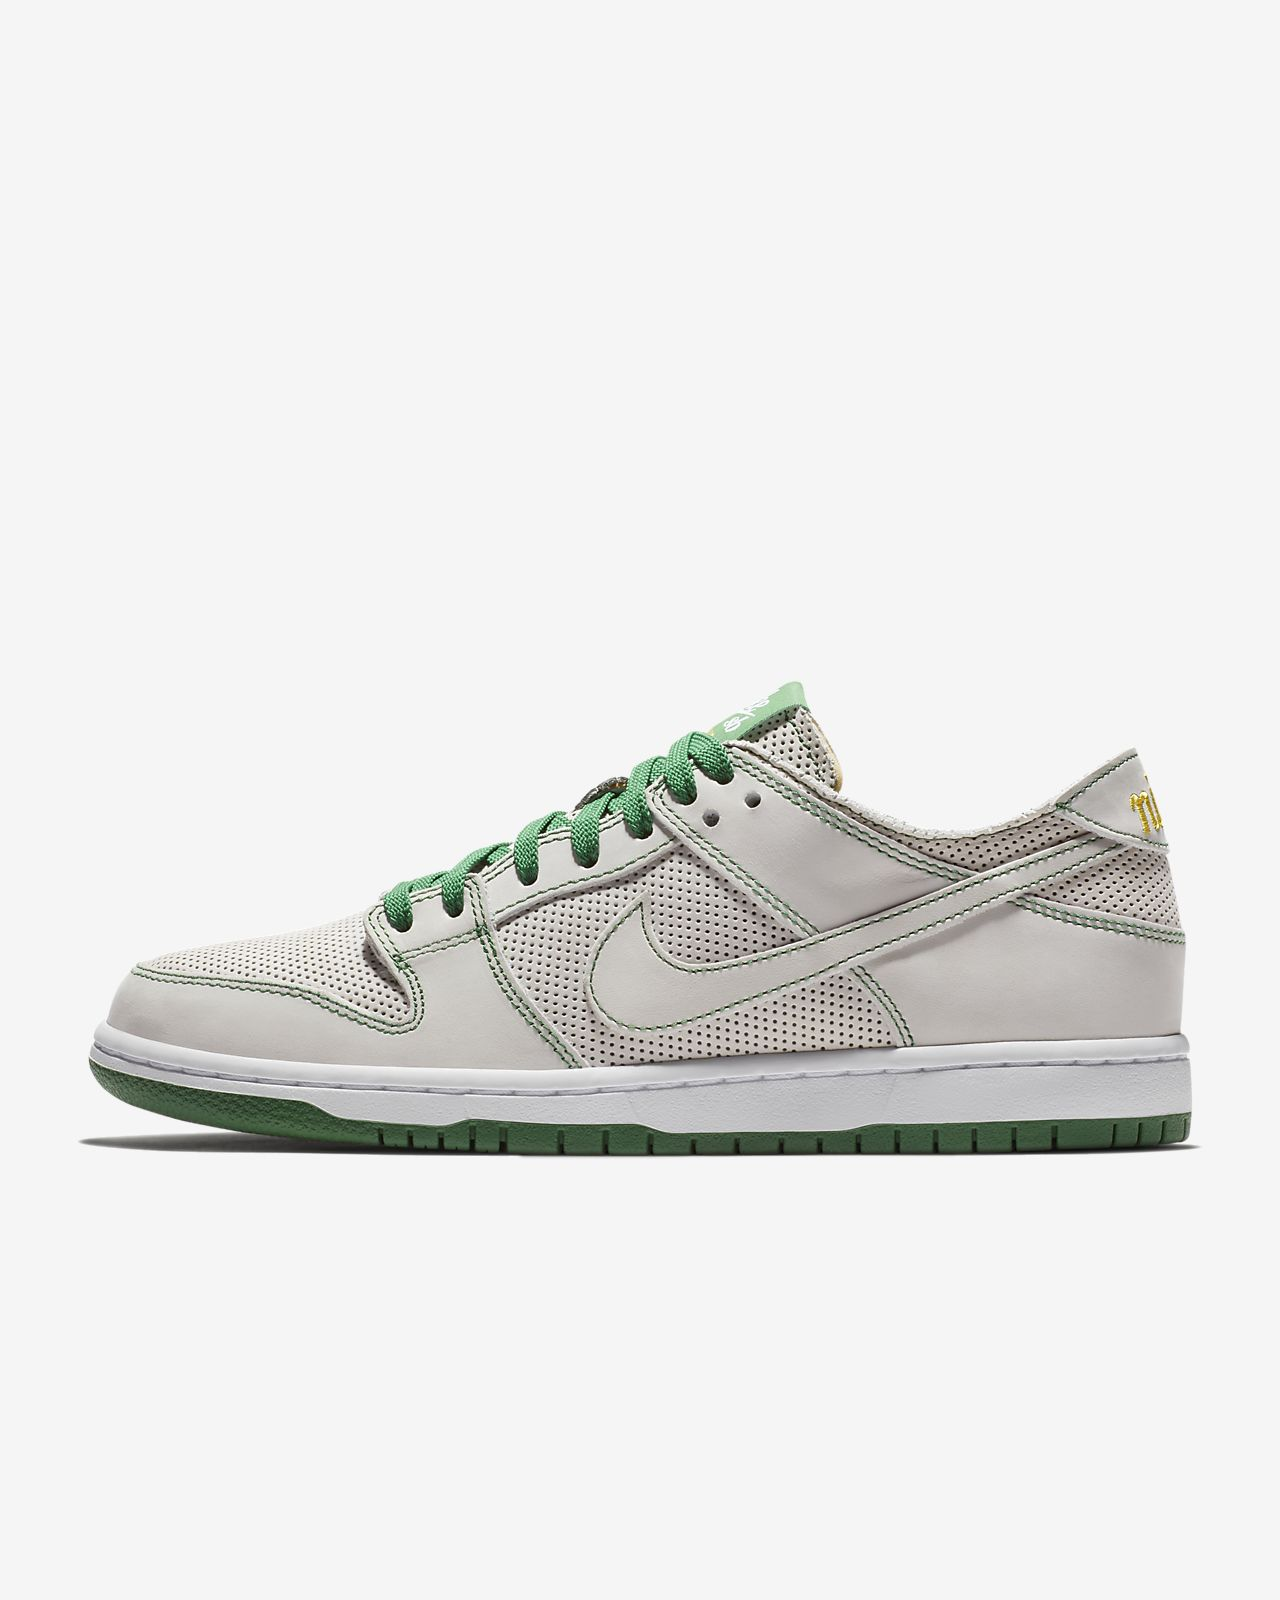 e06f3d5ebbc2 Nike SB Zoom Dunk Low Pro Deconstructed QS X Ishod Wair Men s ...